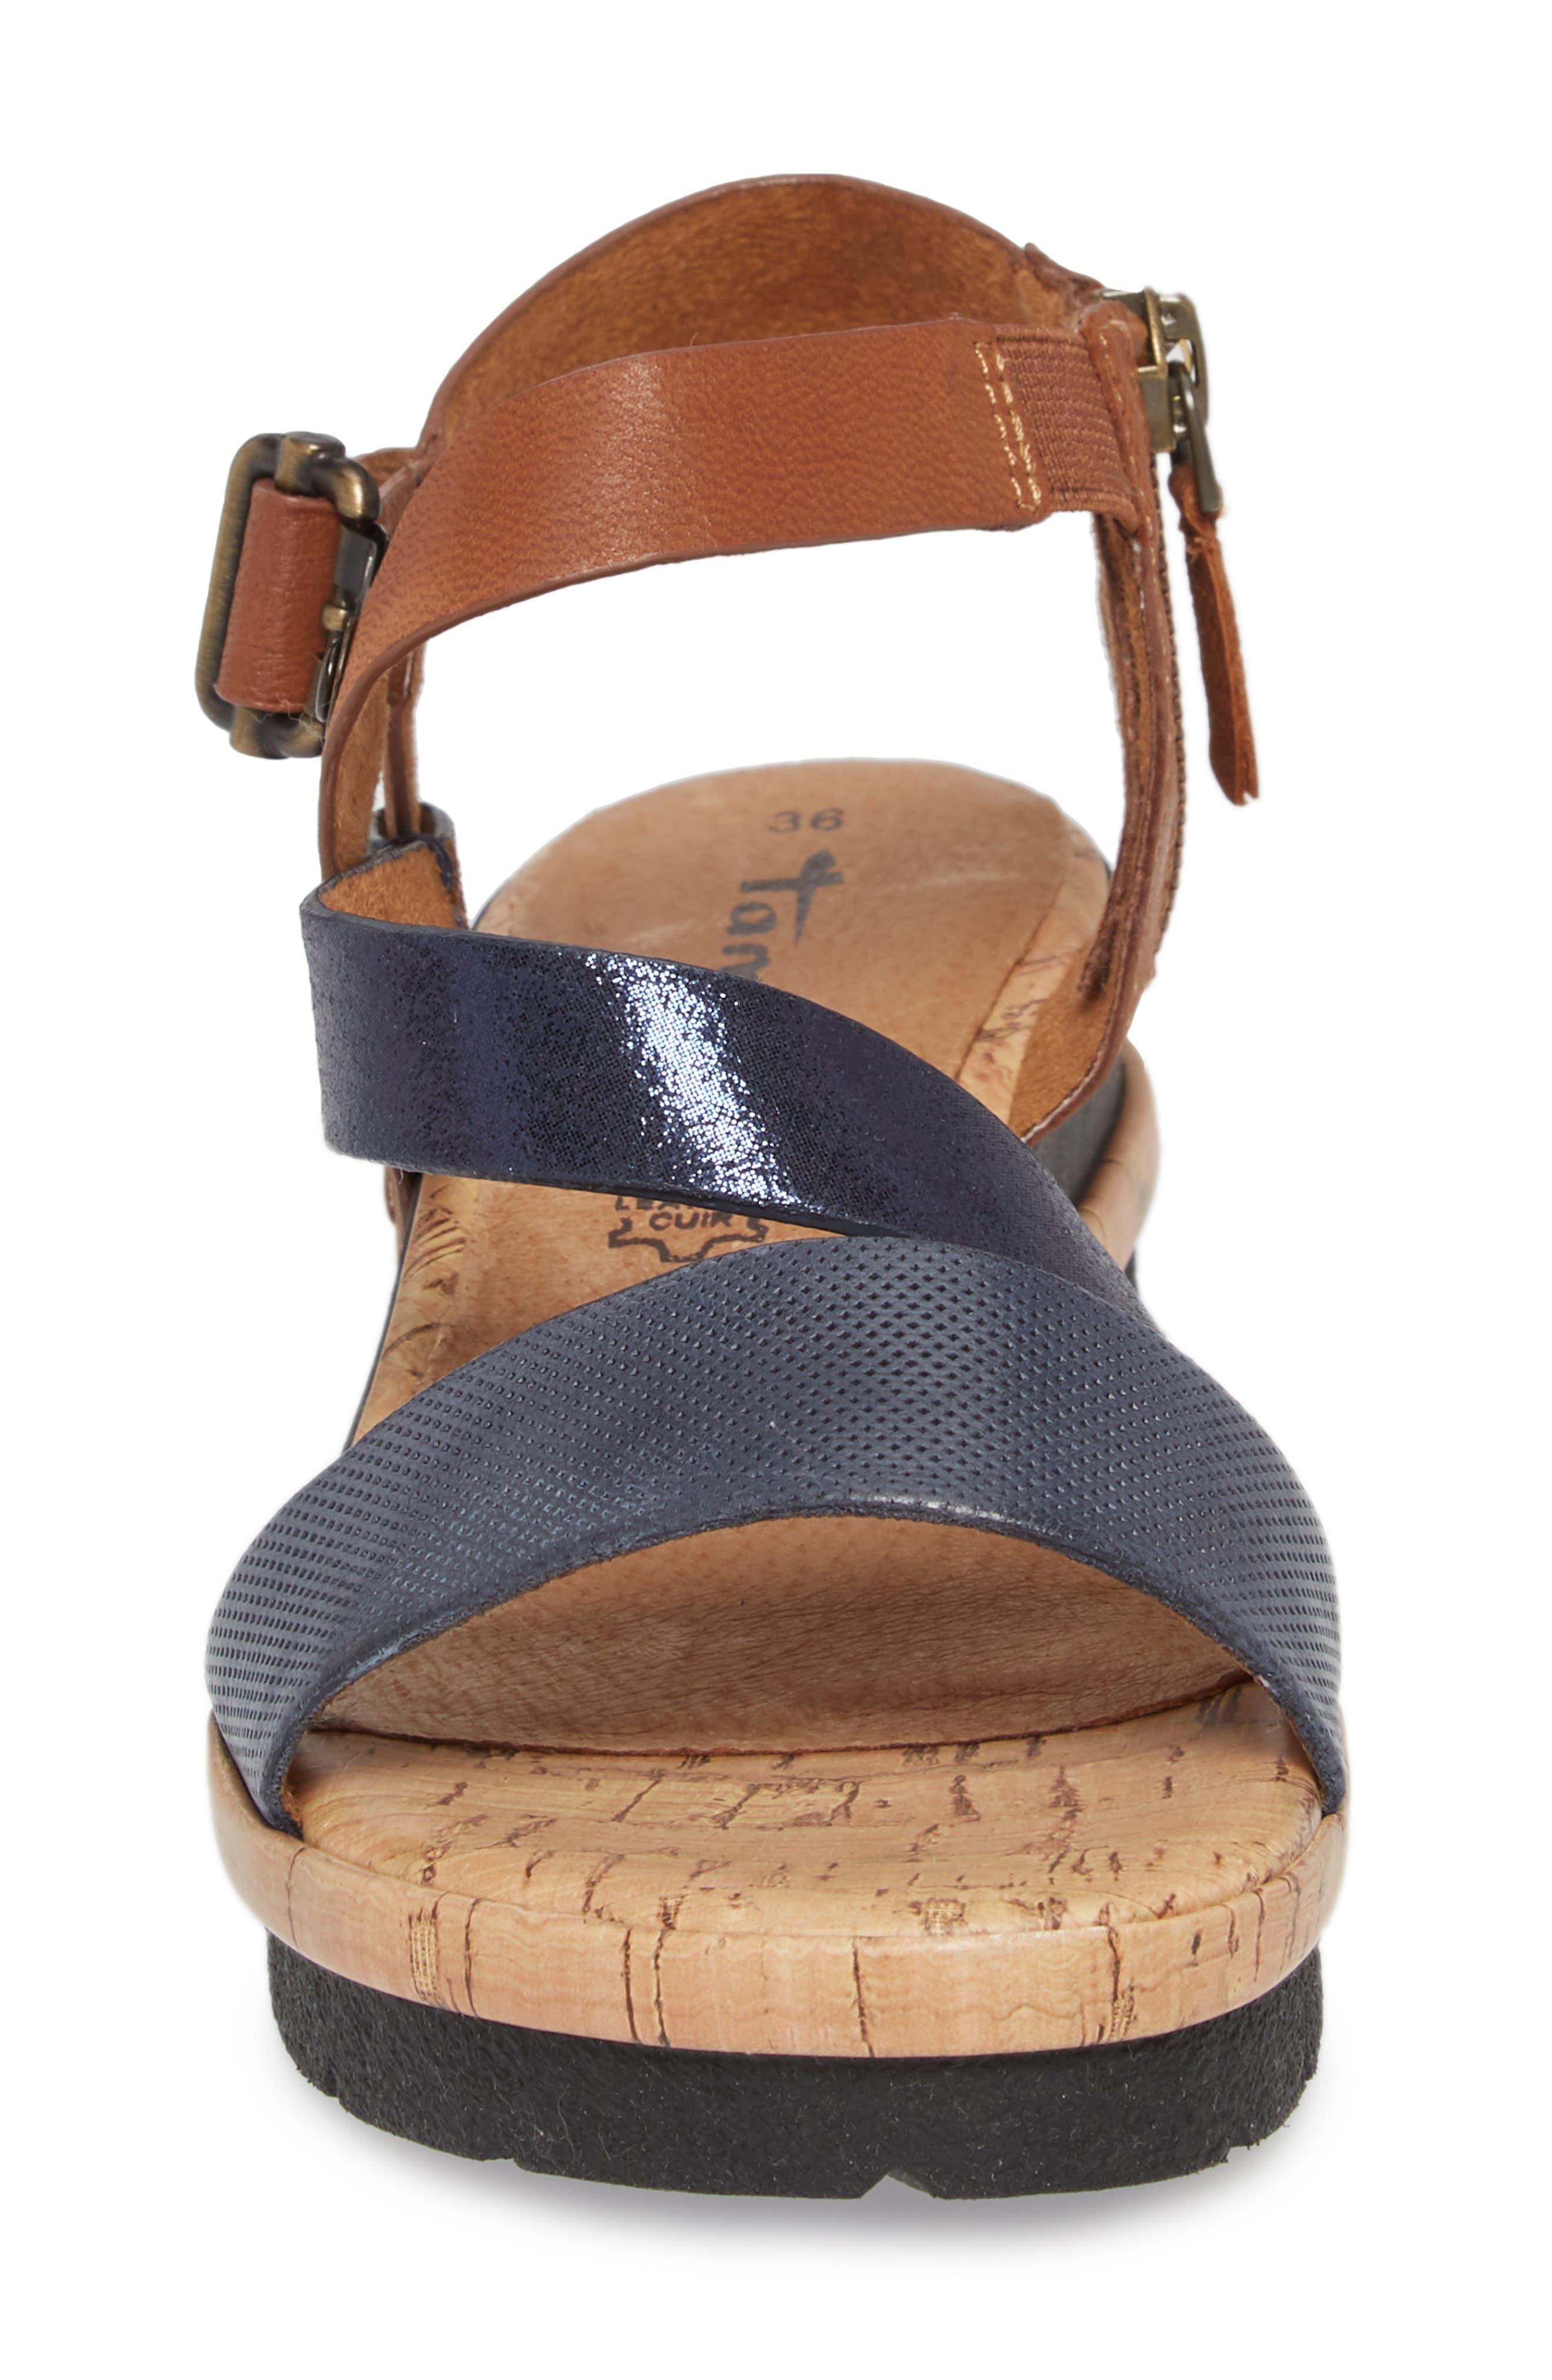 Eda Diagonal Strap Wedge Sandal,                             Alternate thumbnail 4, color,                             Navy/ Cognac Leather